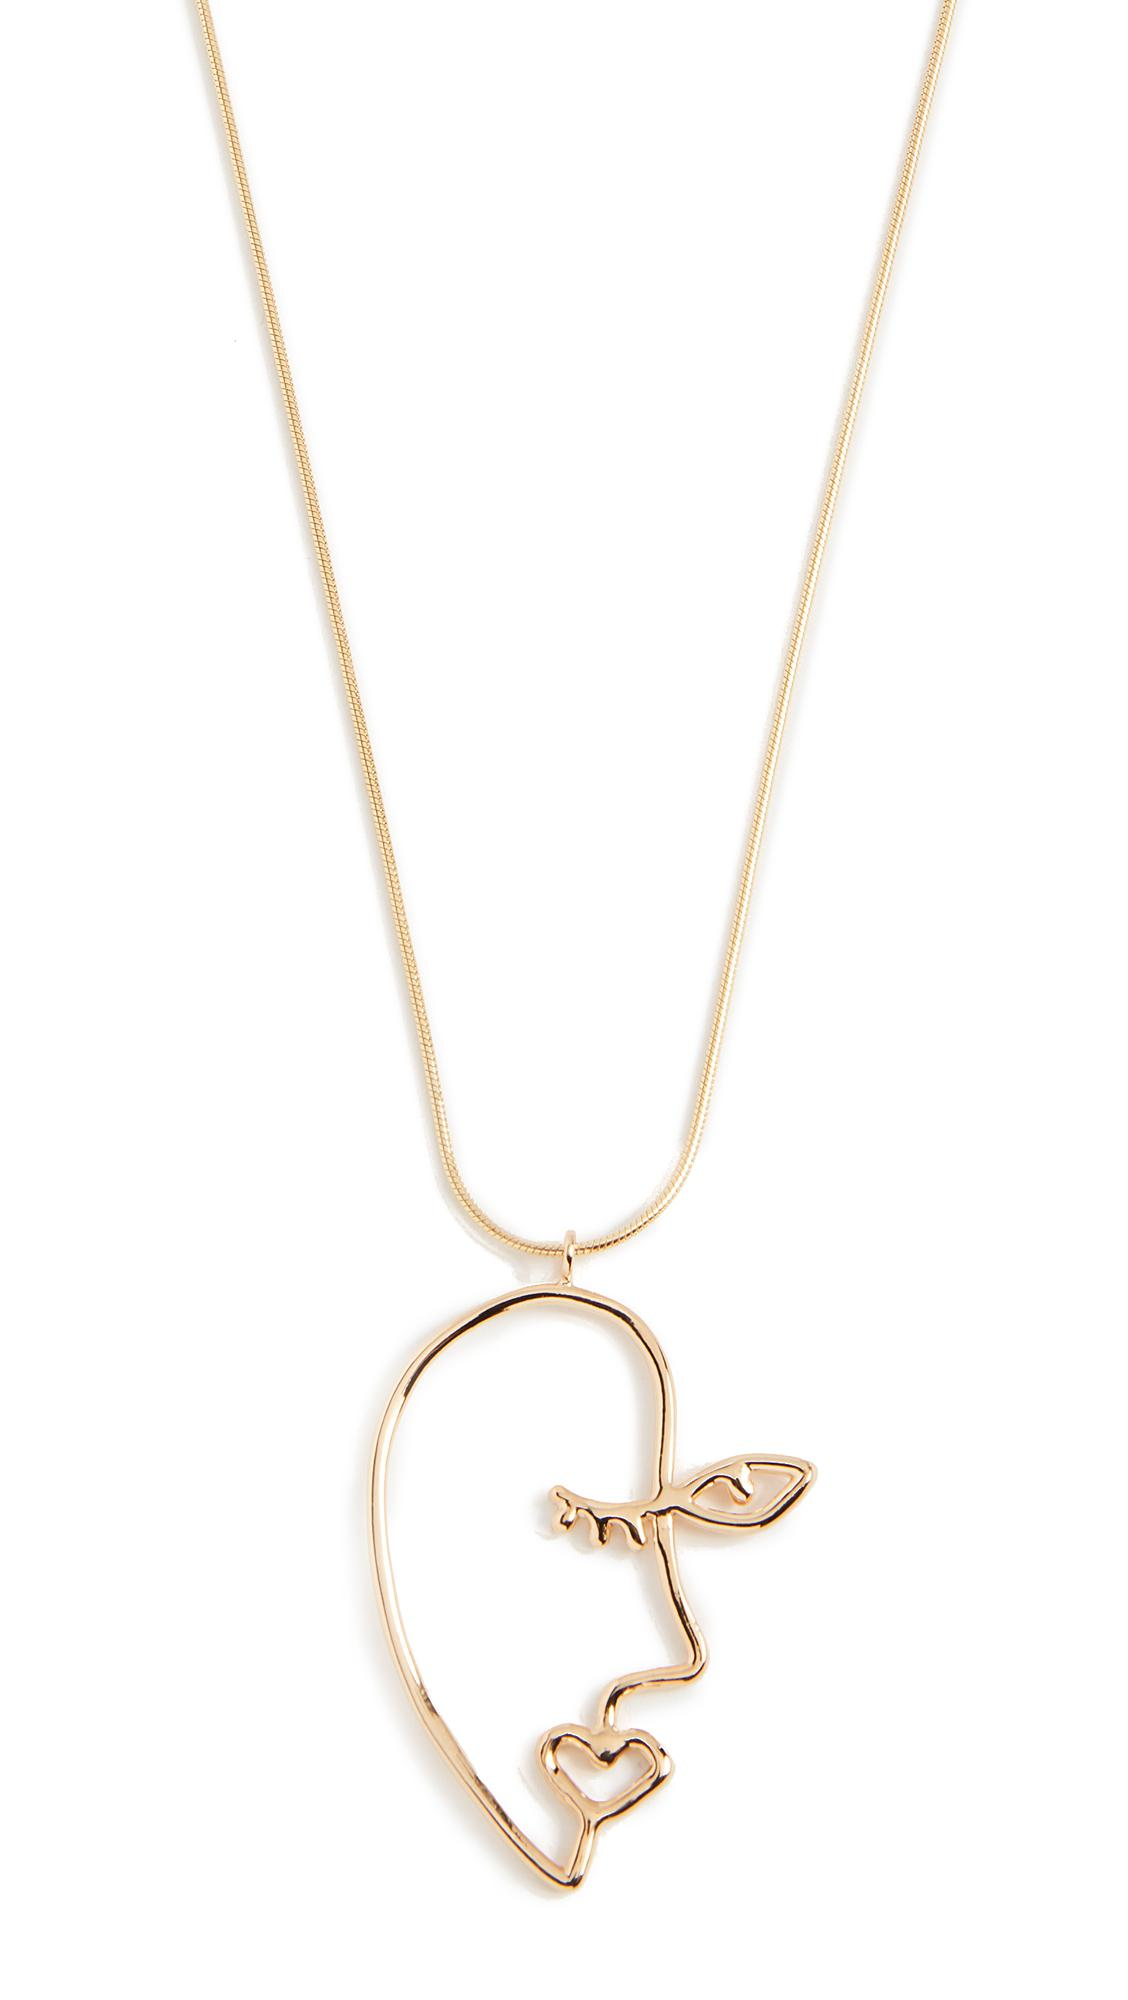 CONTEMPOH Profile Necklace in Gold (Metallic)